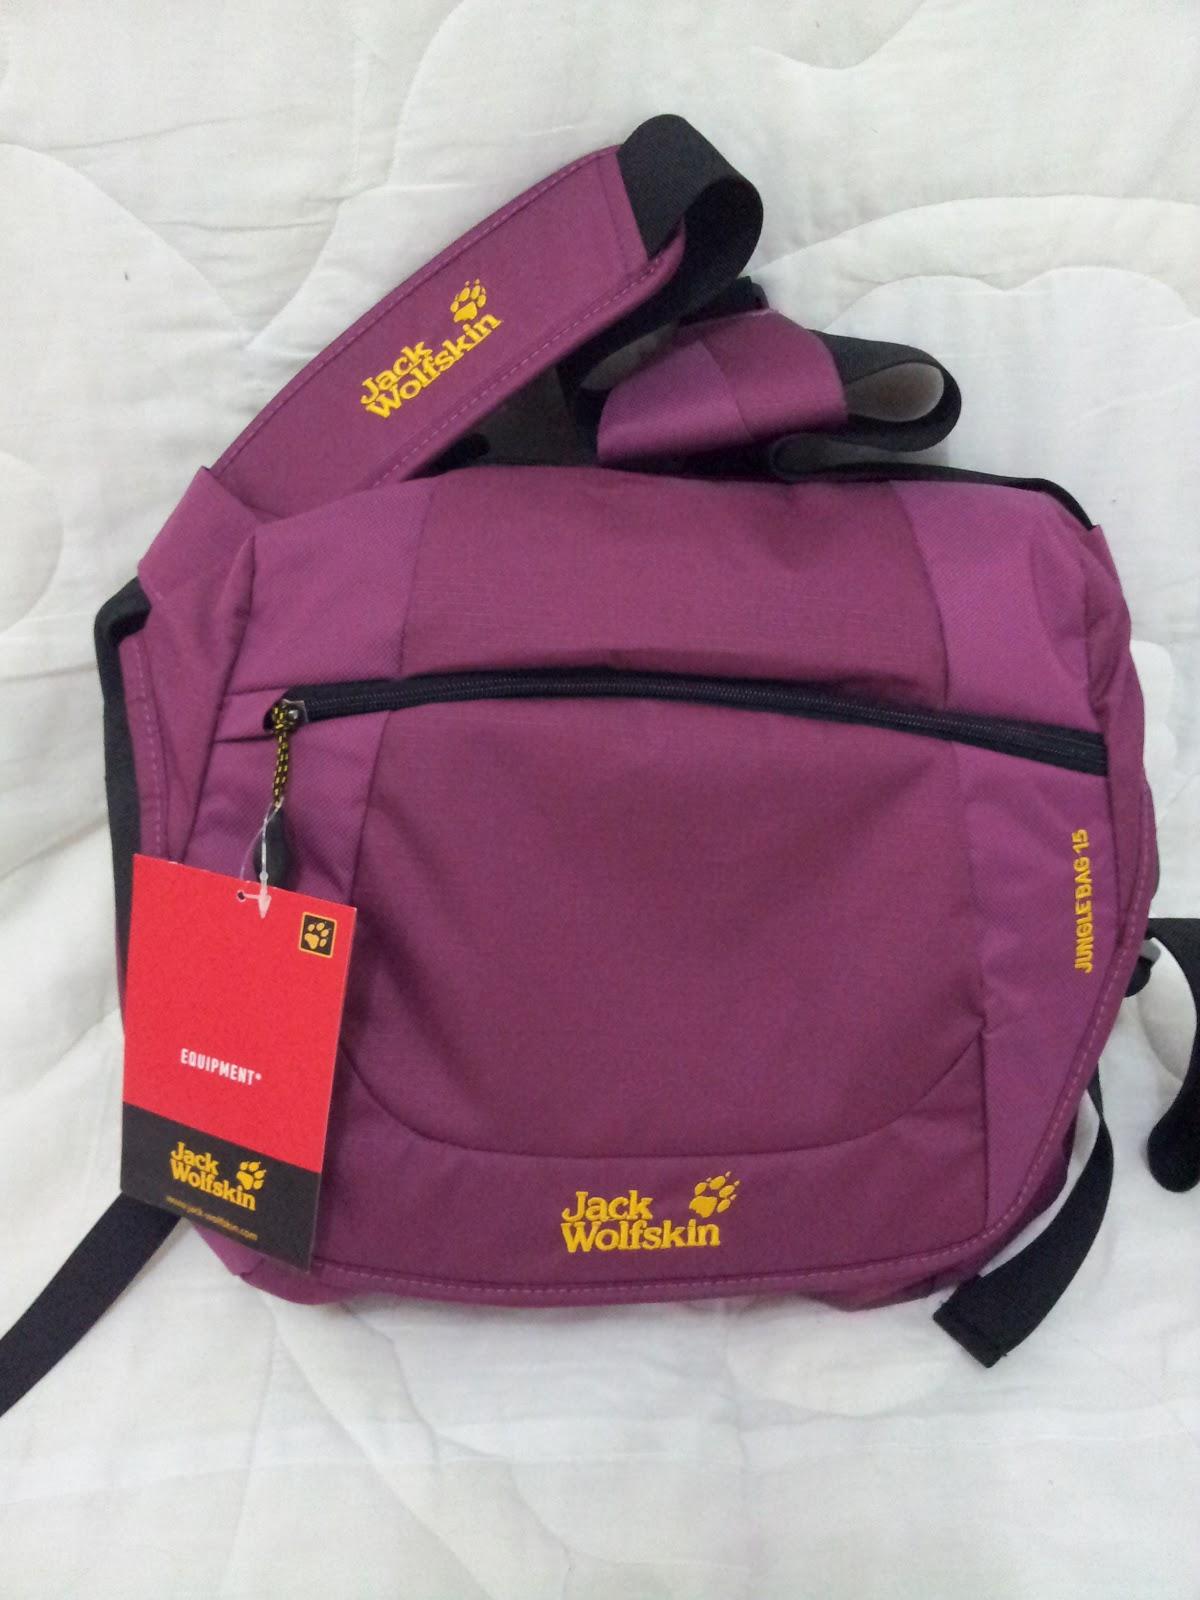 8ec75cf1fa Outdoor Shoppe Malaysia: Jungle Bag Jack Wolfskin 15